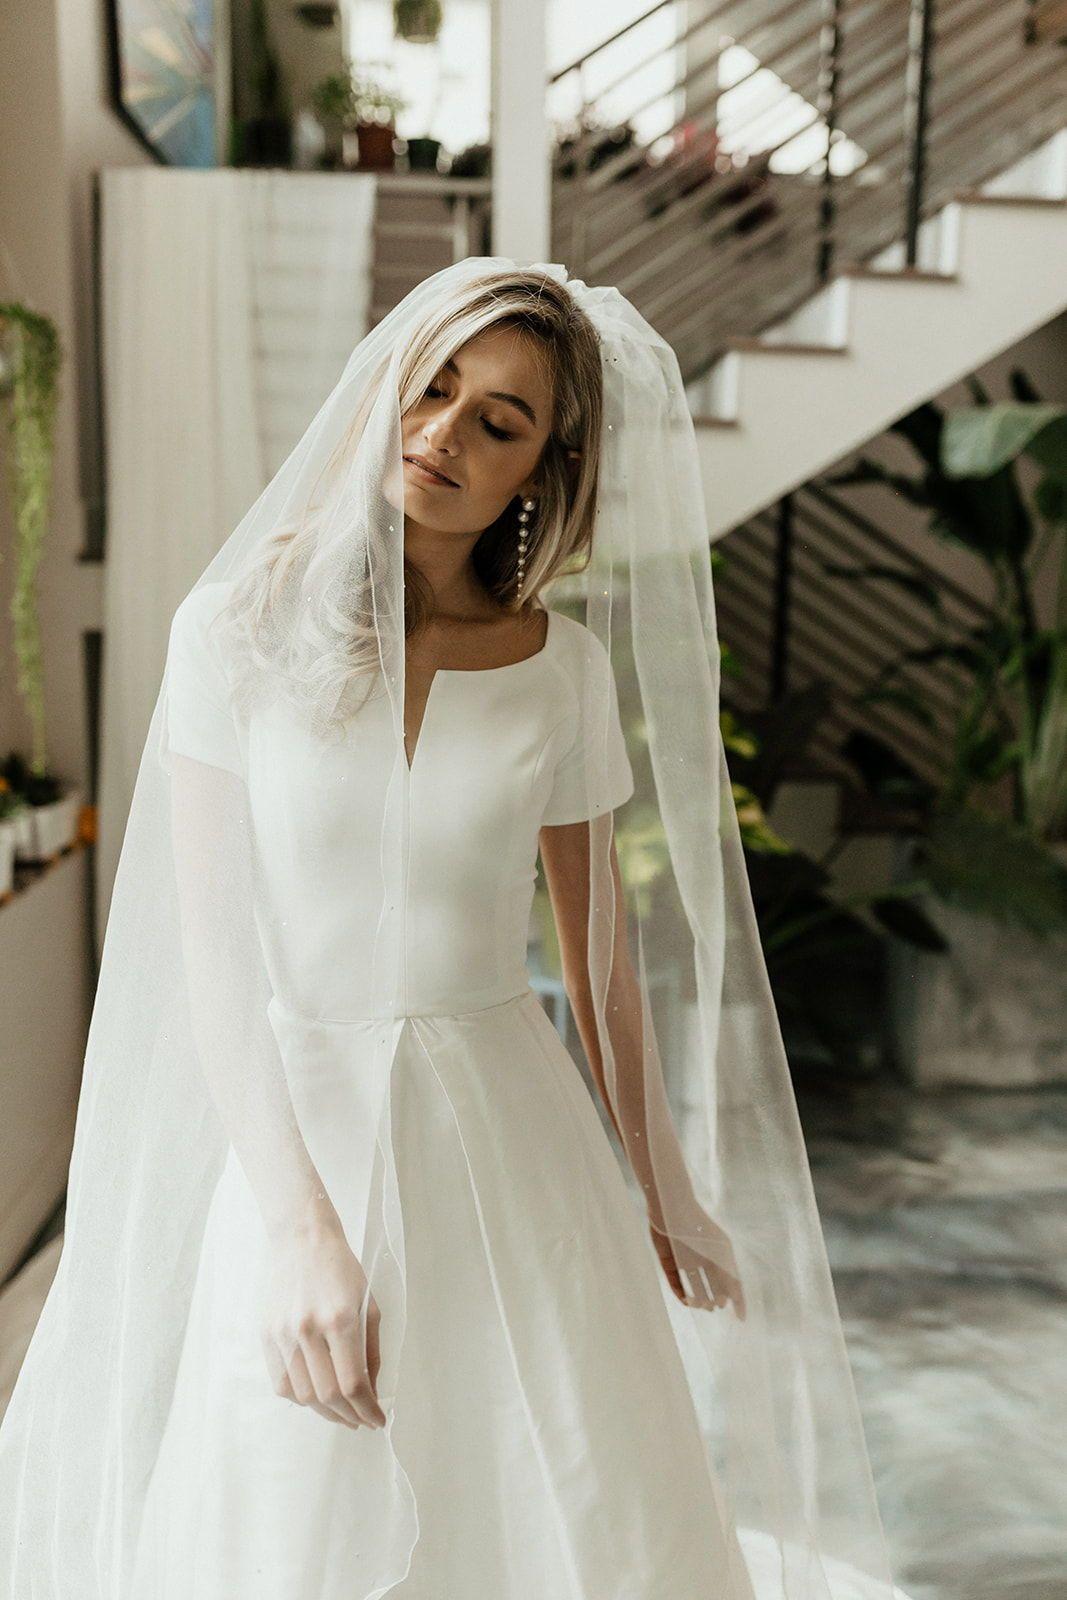 Minimal Classic Modest Short Sleeve Wedding Dress Modest Wedding Dresses Boat Neck Wedding Dress [ 1600 x 1067 Pixel ]